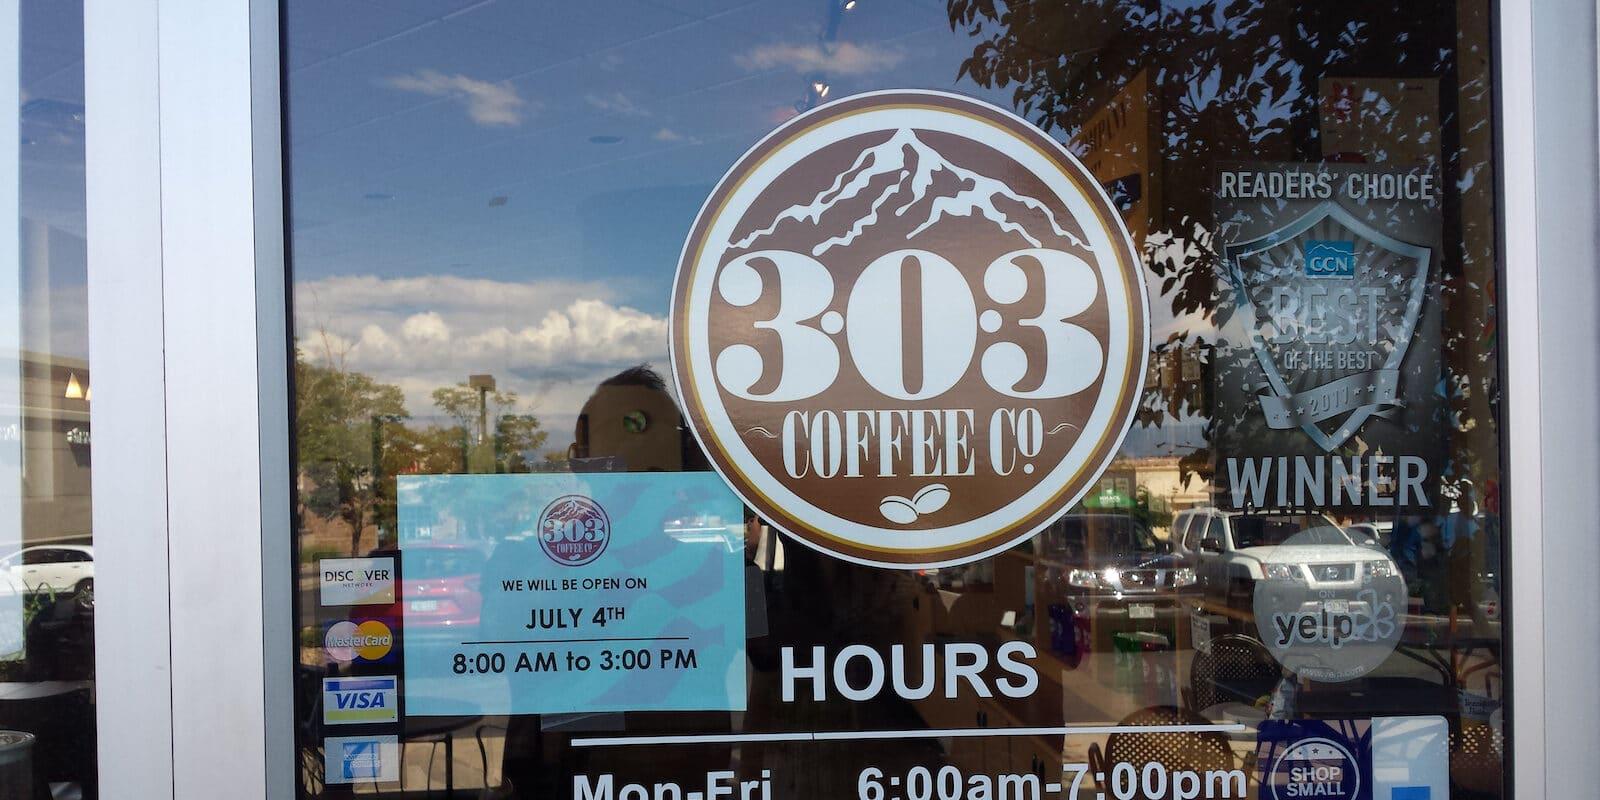 Colorado Area Code 303 Coffee Co Sign